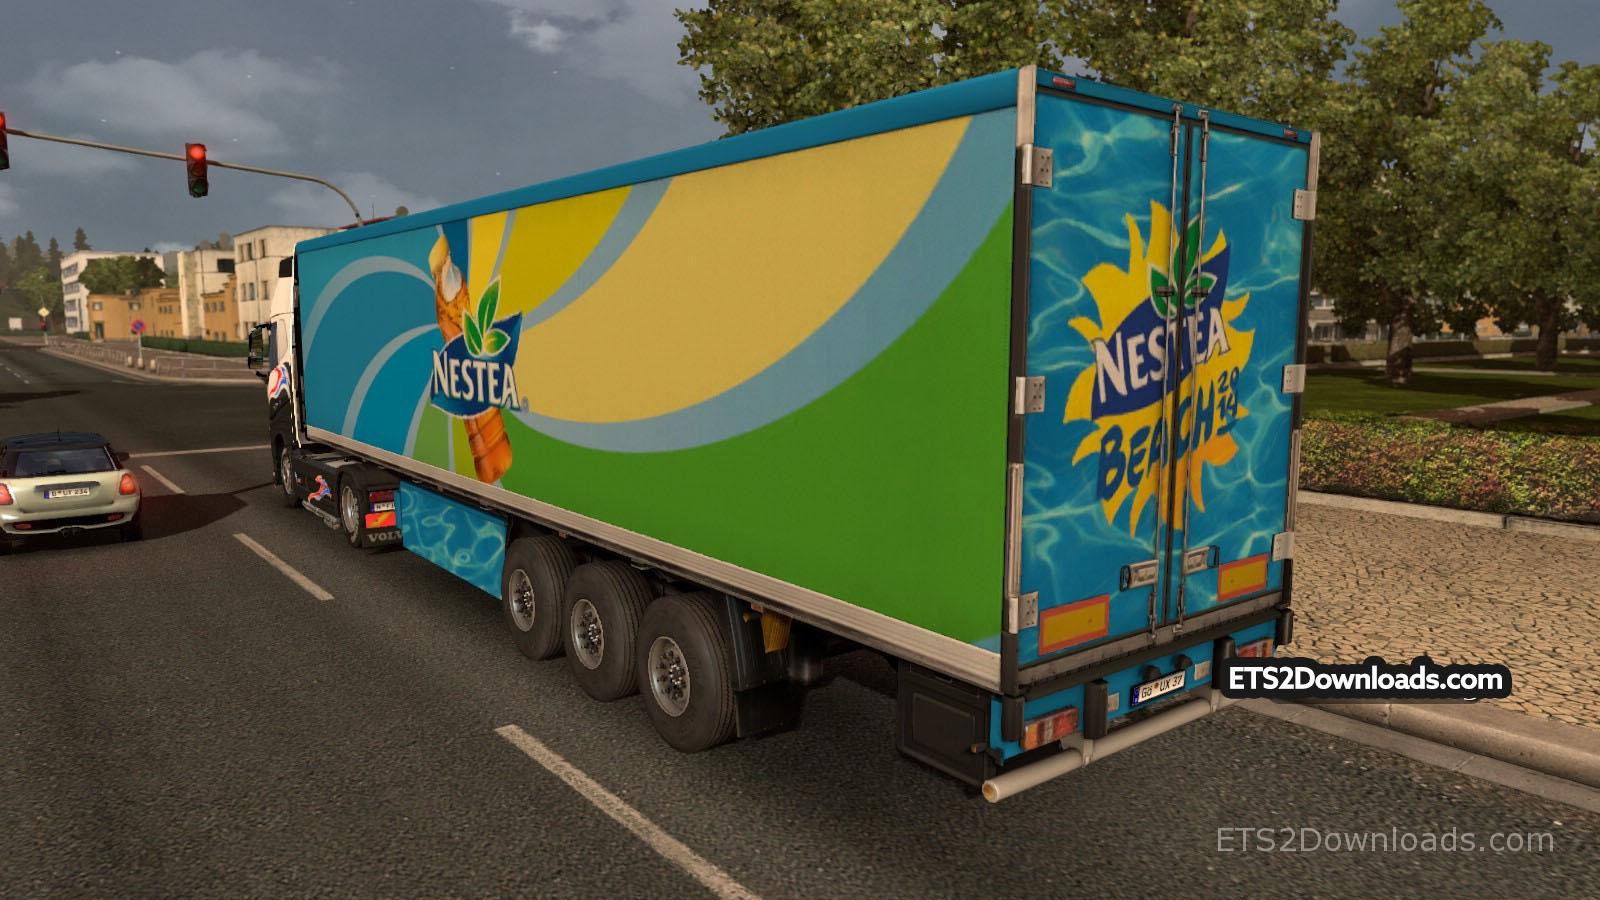 nestea-trailer